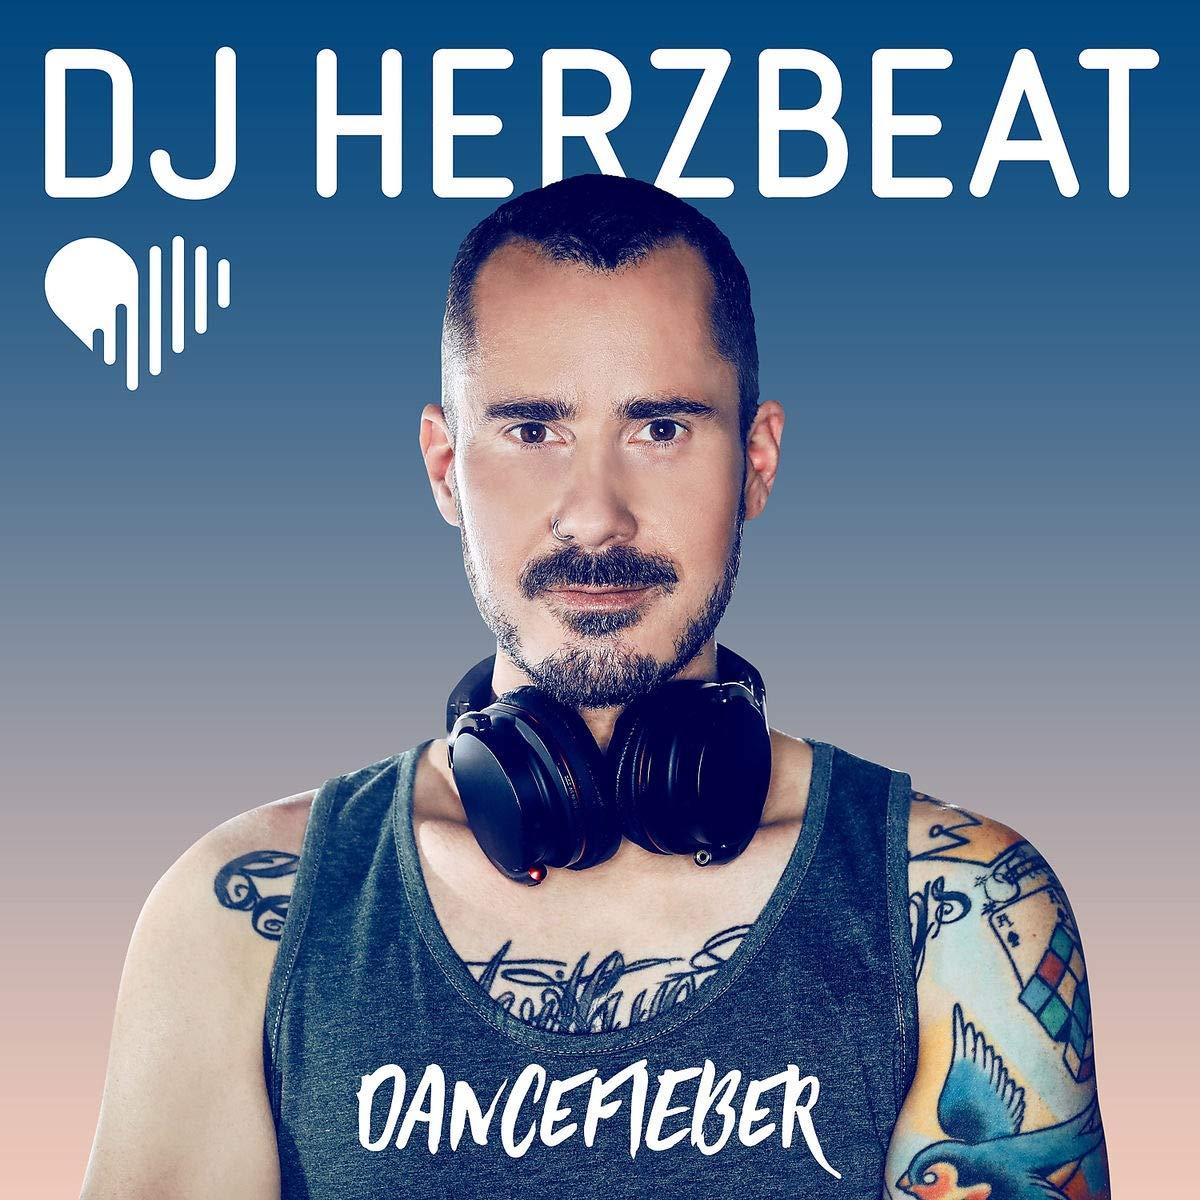 DJ HERZBEAT * Dancefieber (CD)